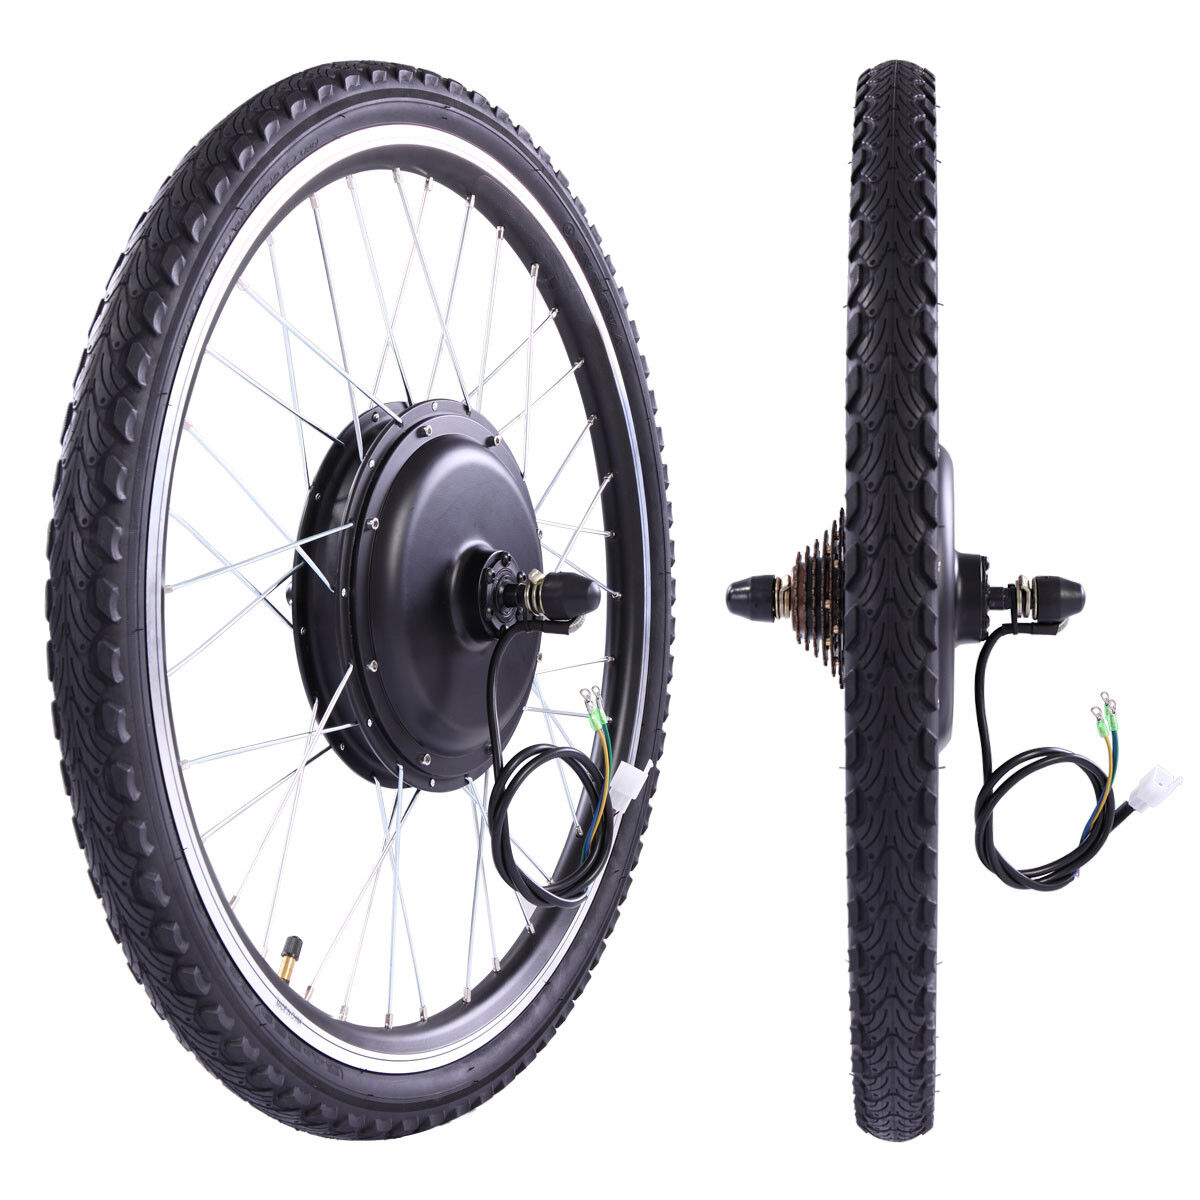 "48V 1000W Electric Bicycle Cycle E Bike 26""Conversion Kit Hu"